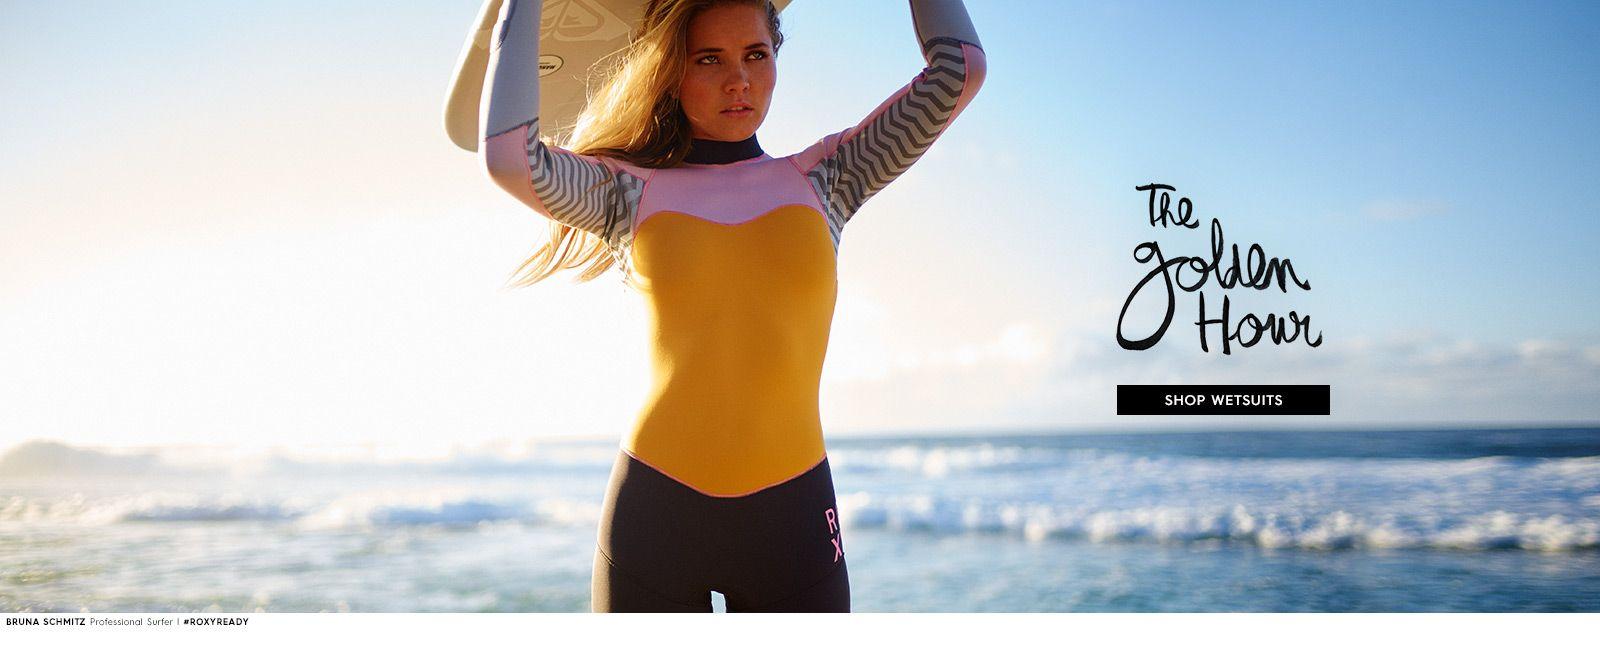 27870cc164 Womens Surf Gear   Accessories